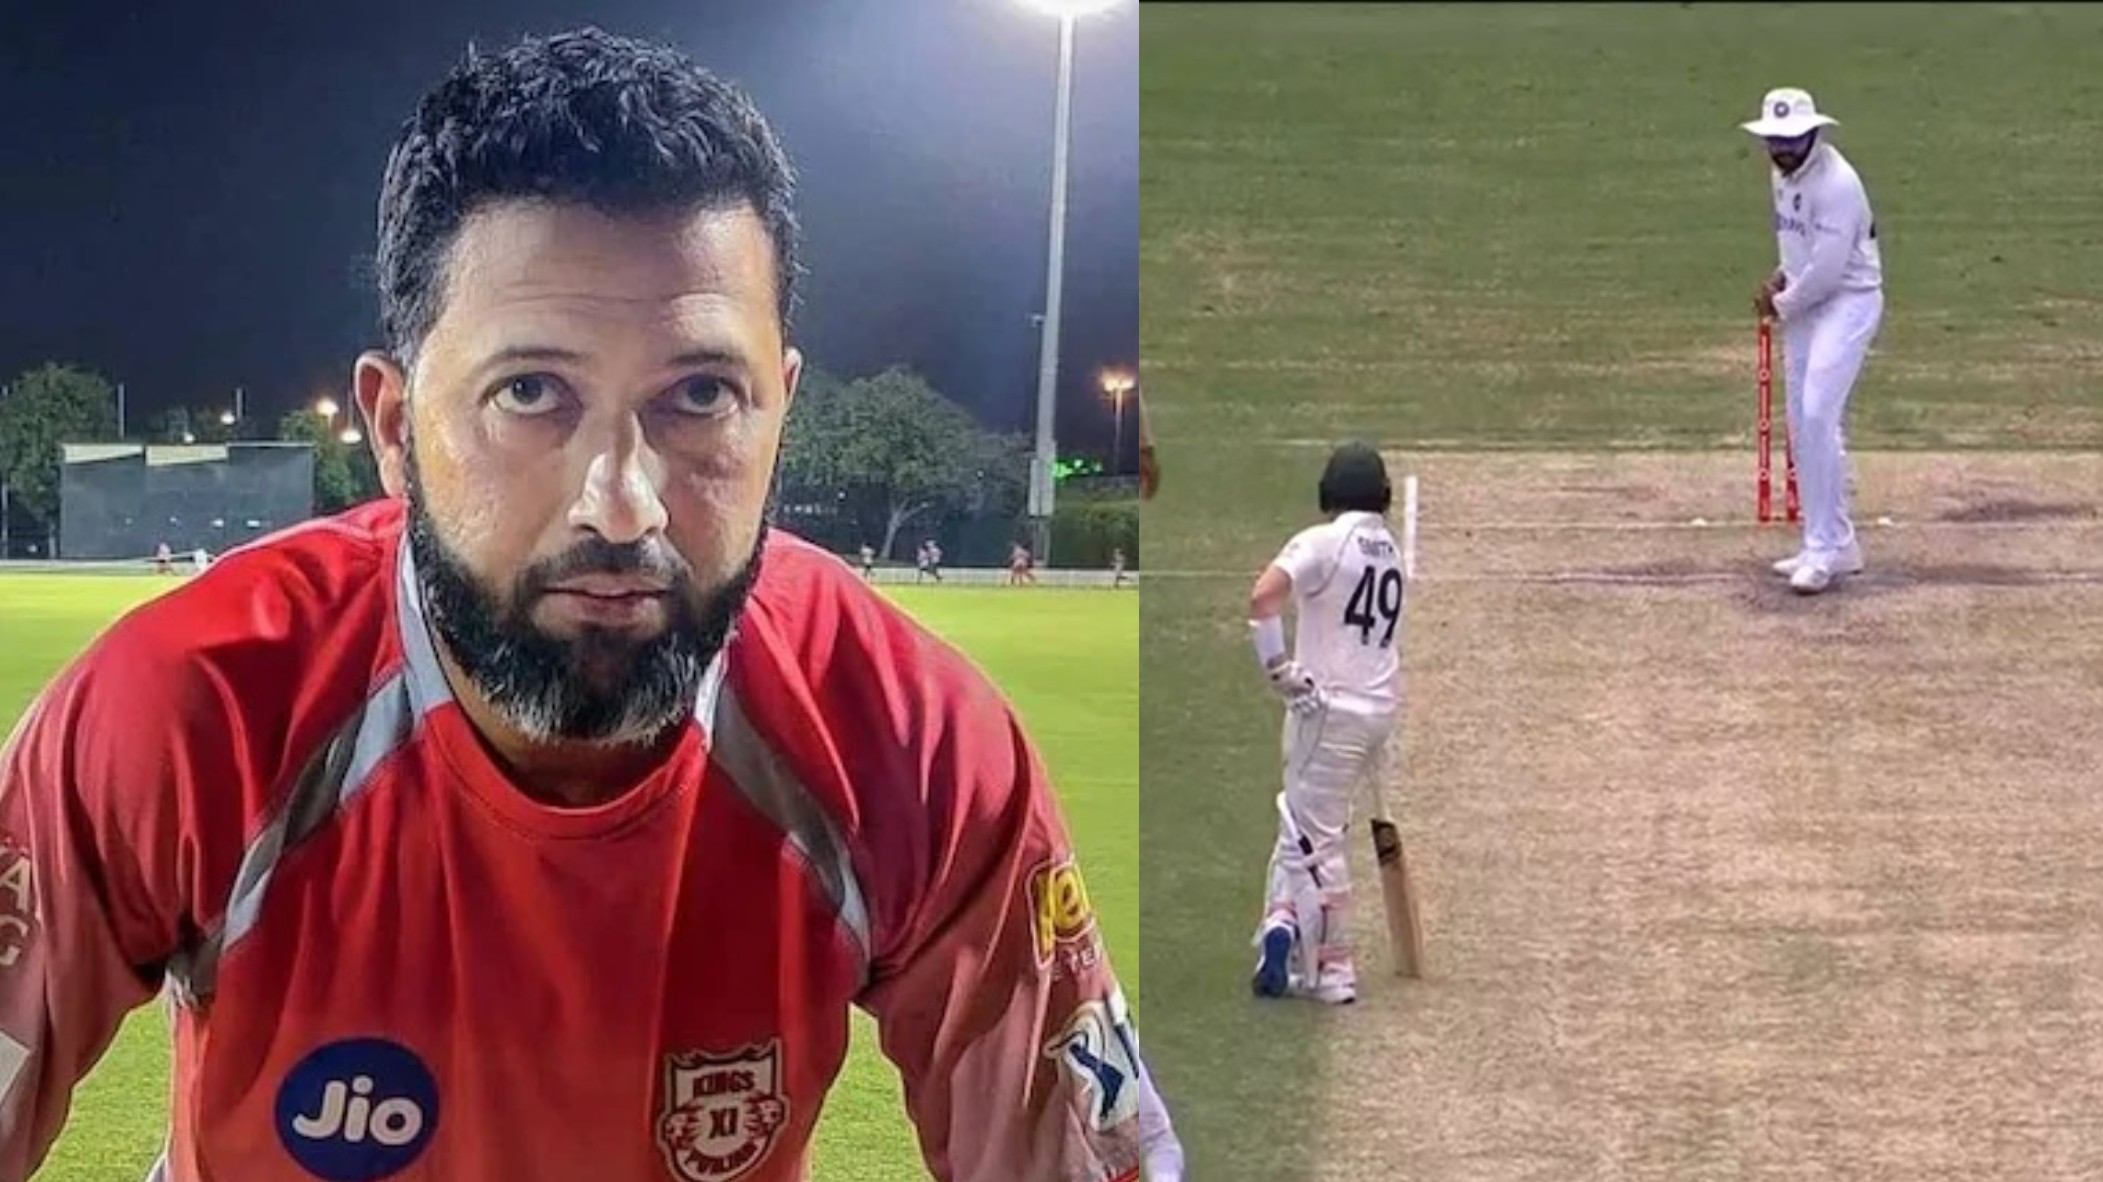 AUS v IND 2020-21: Wasim Jaffer makes fun of Steve Smith after Rohit Sharma's shadow batting